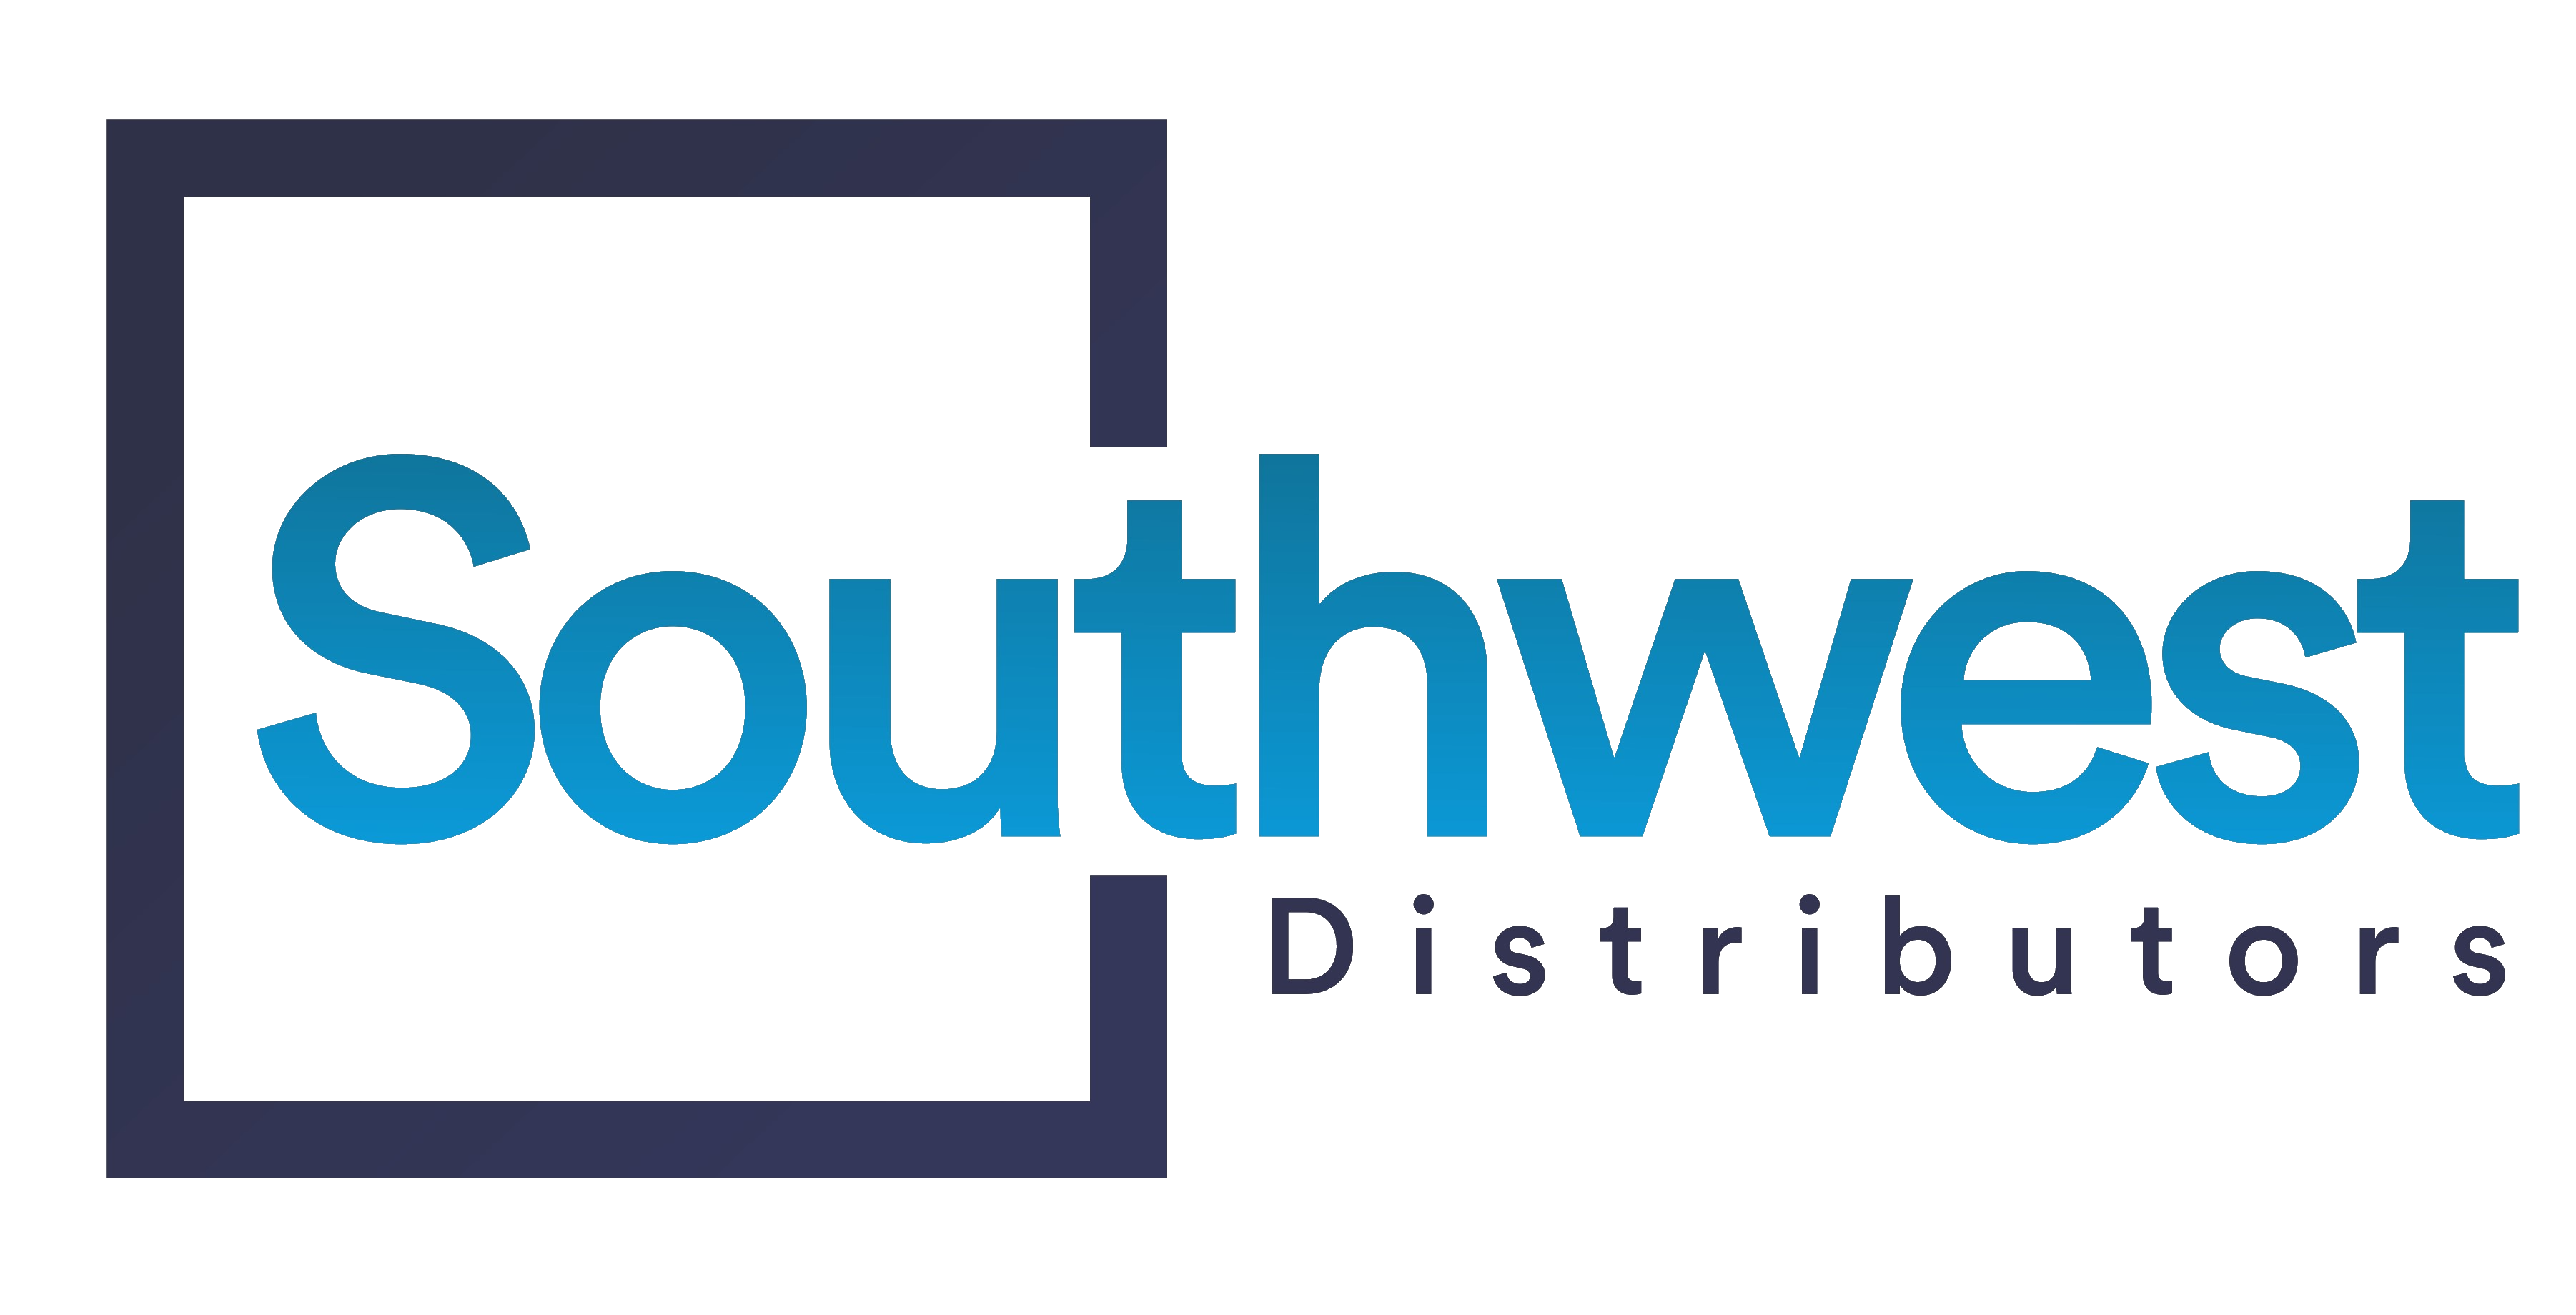 Southwest Distributors